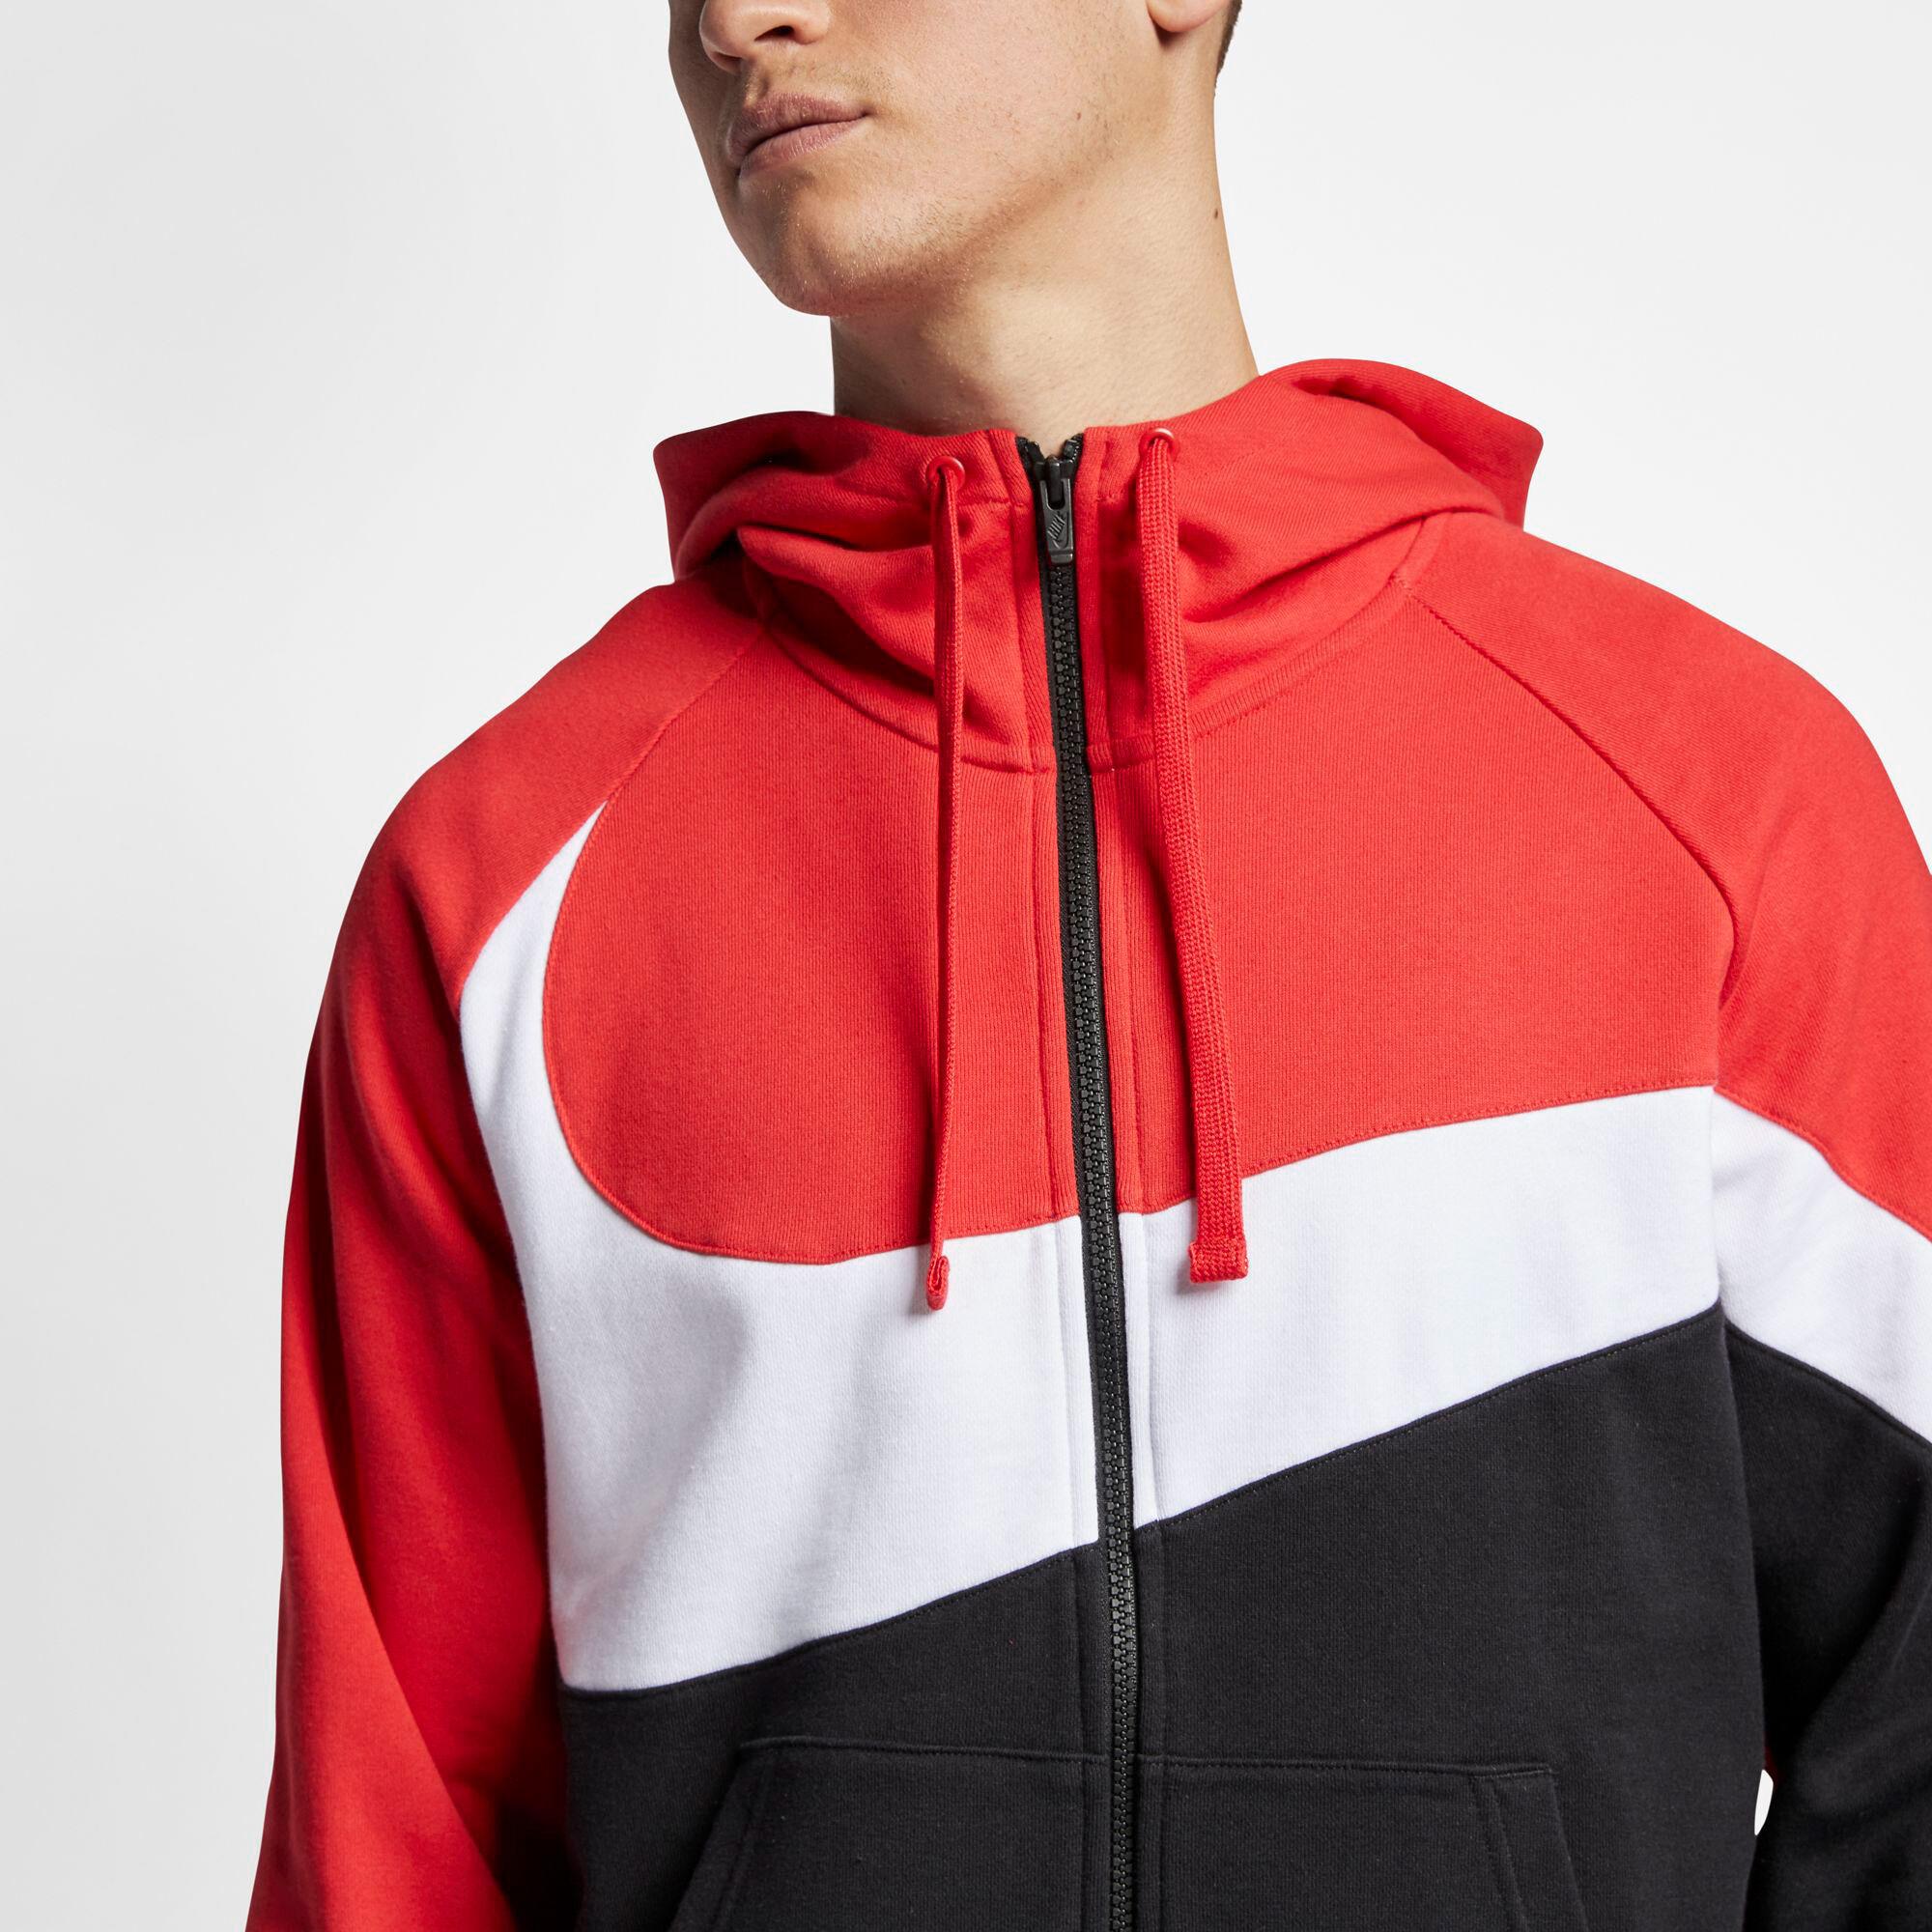 Nike Full Zip · Hbr Sportswear Kapuzenjacke Herren wP80OknX